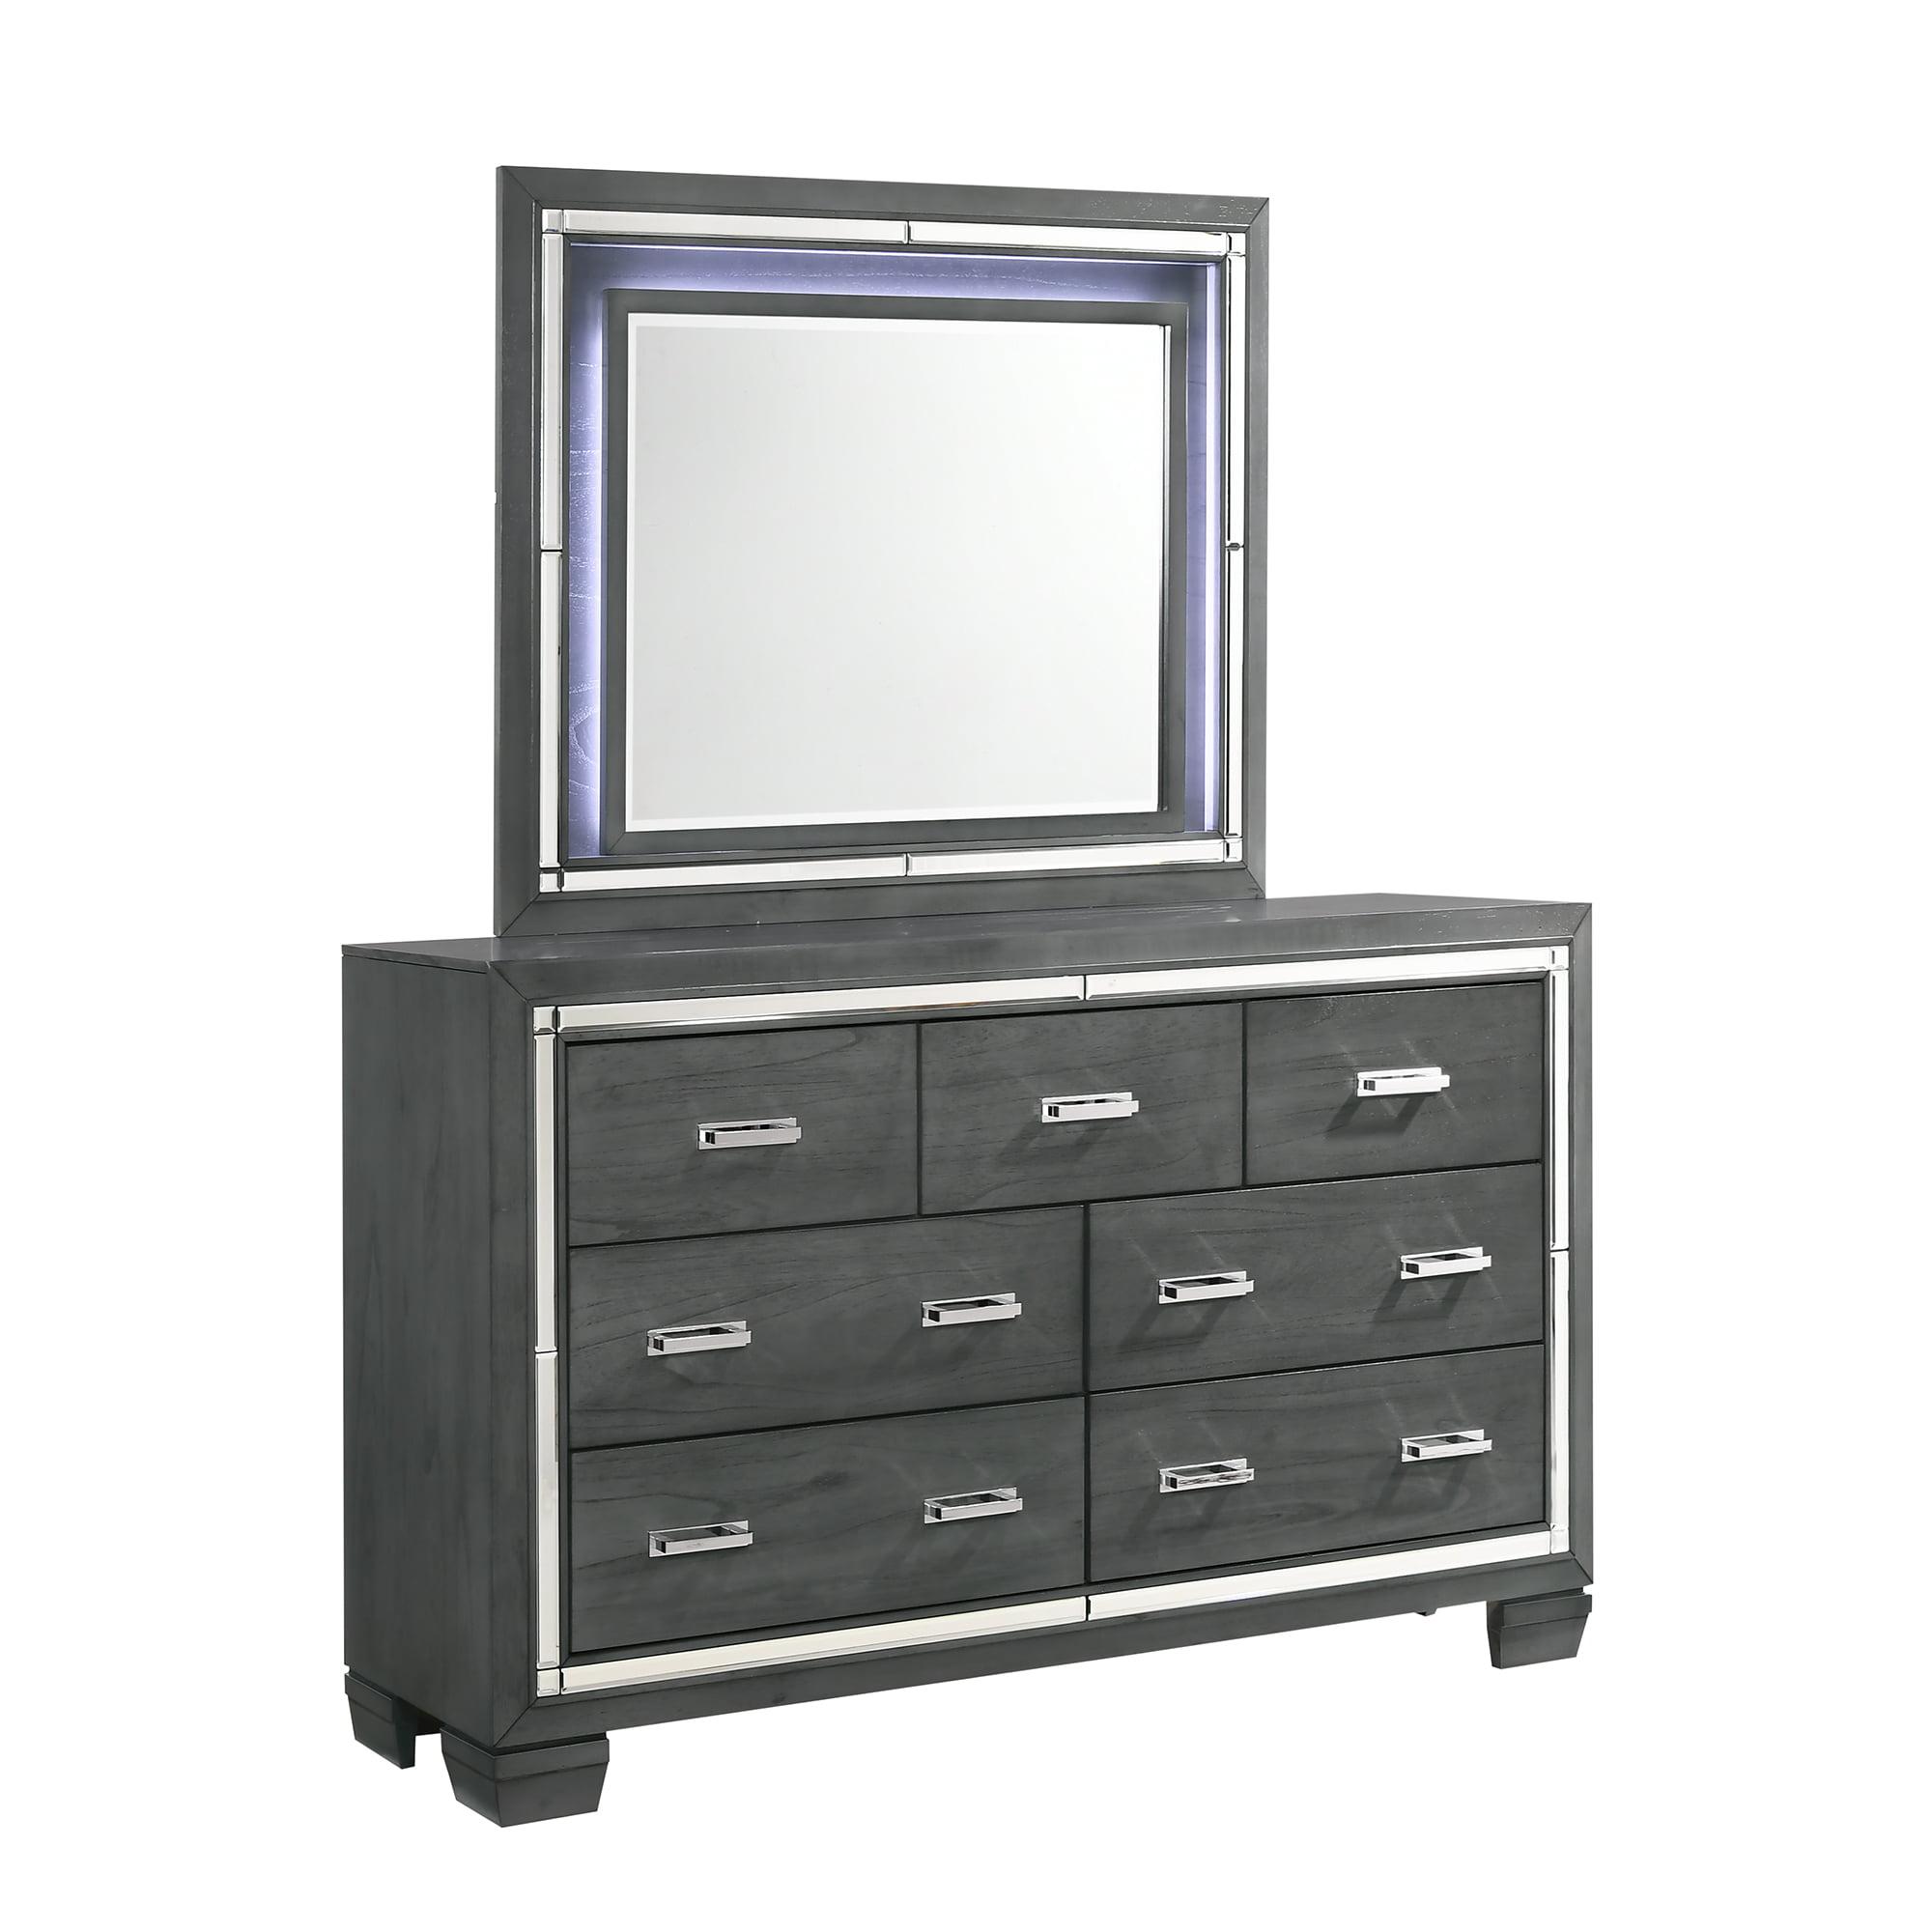 Picket House Furnishings Kenzie 7-Drawer Dresser w/ Mirror Set